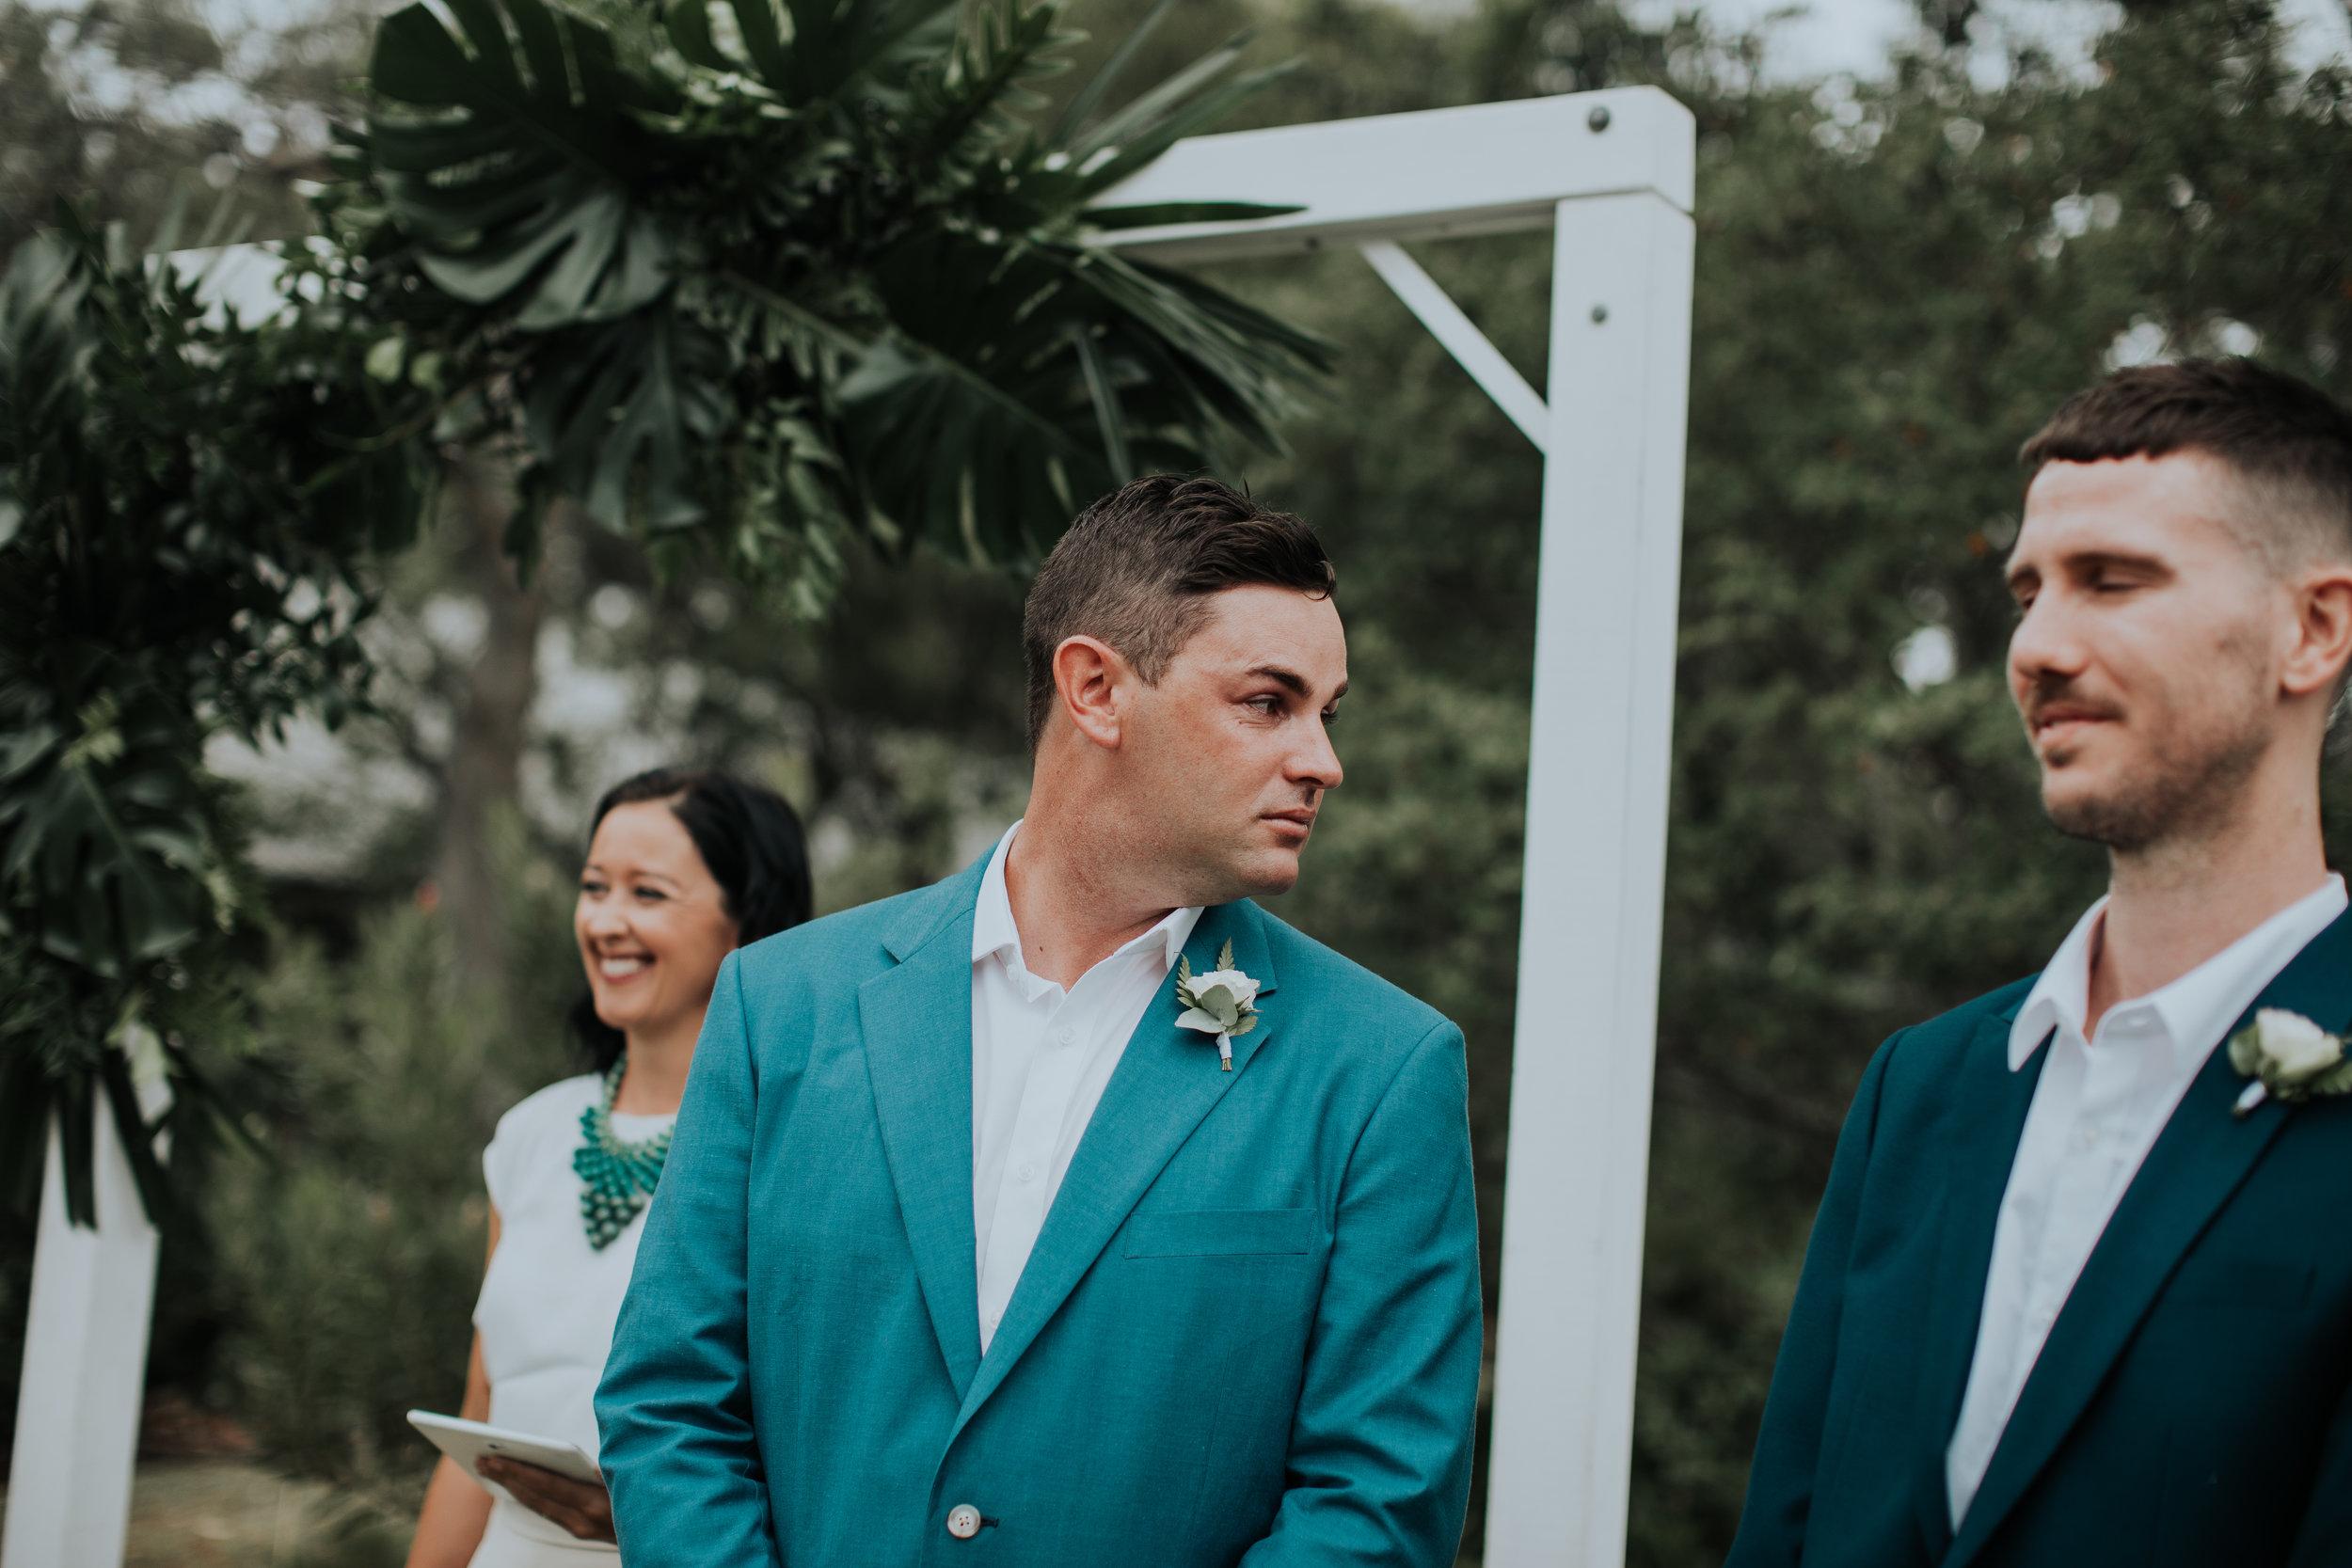 Luxury Khaki Suit For Wedding Images - All Wedding Dresses ...